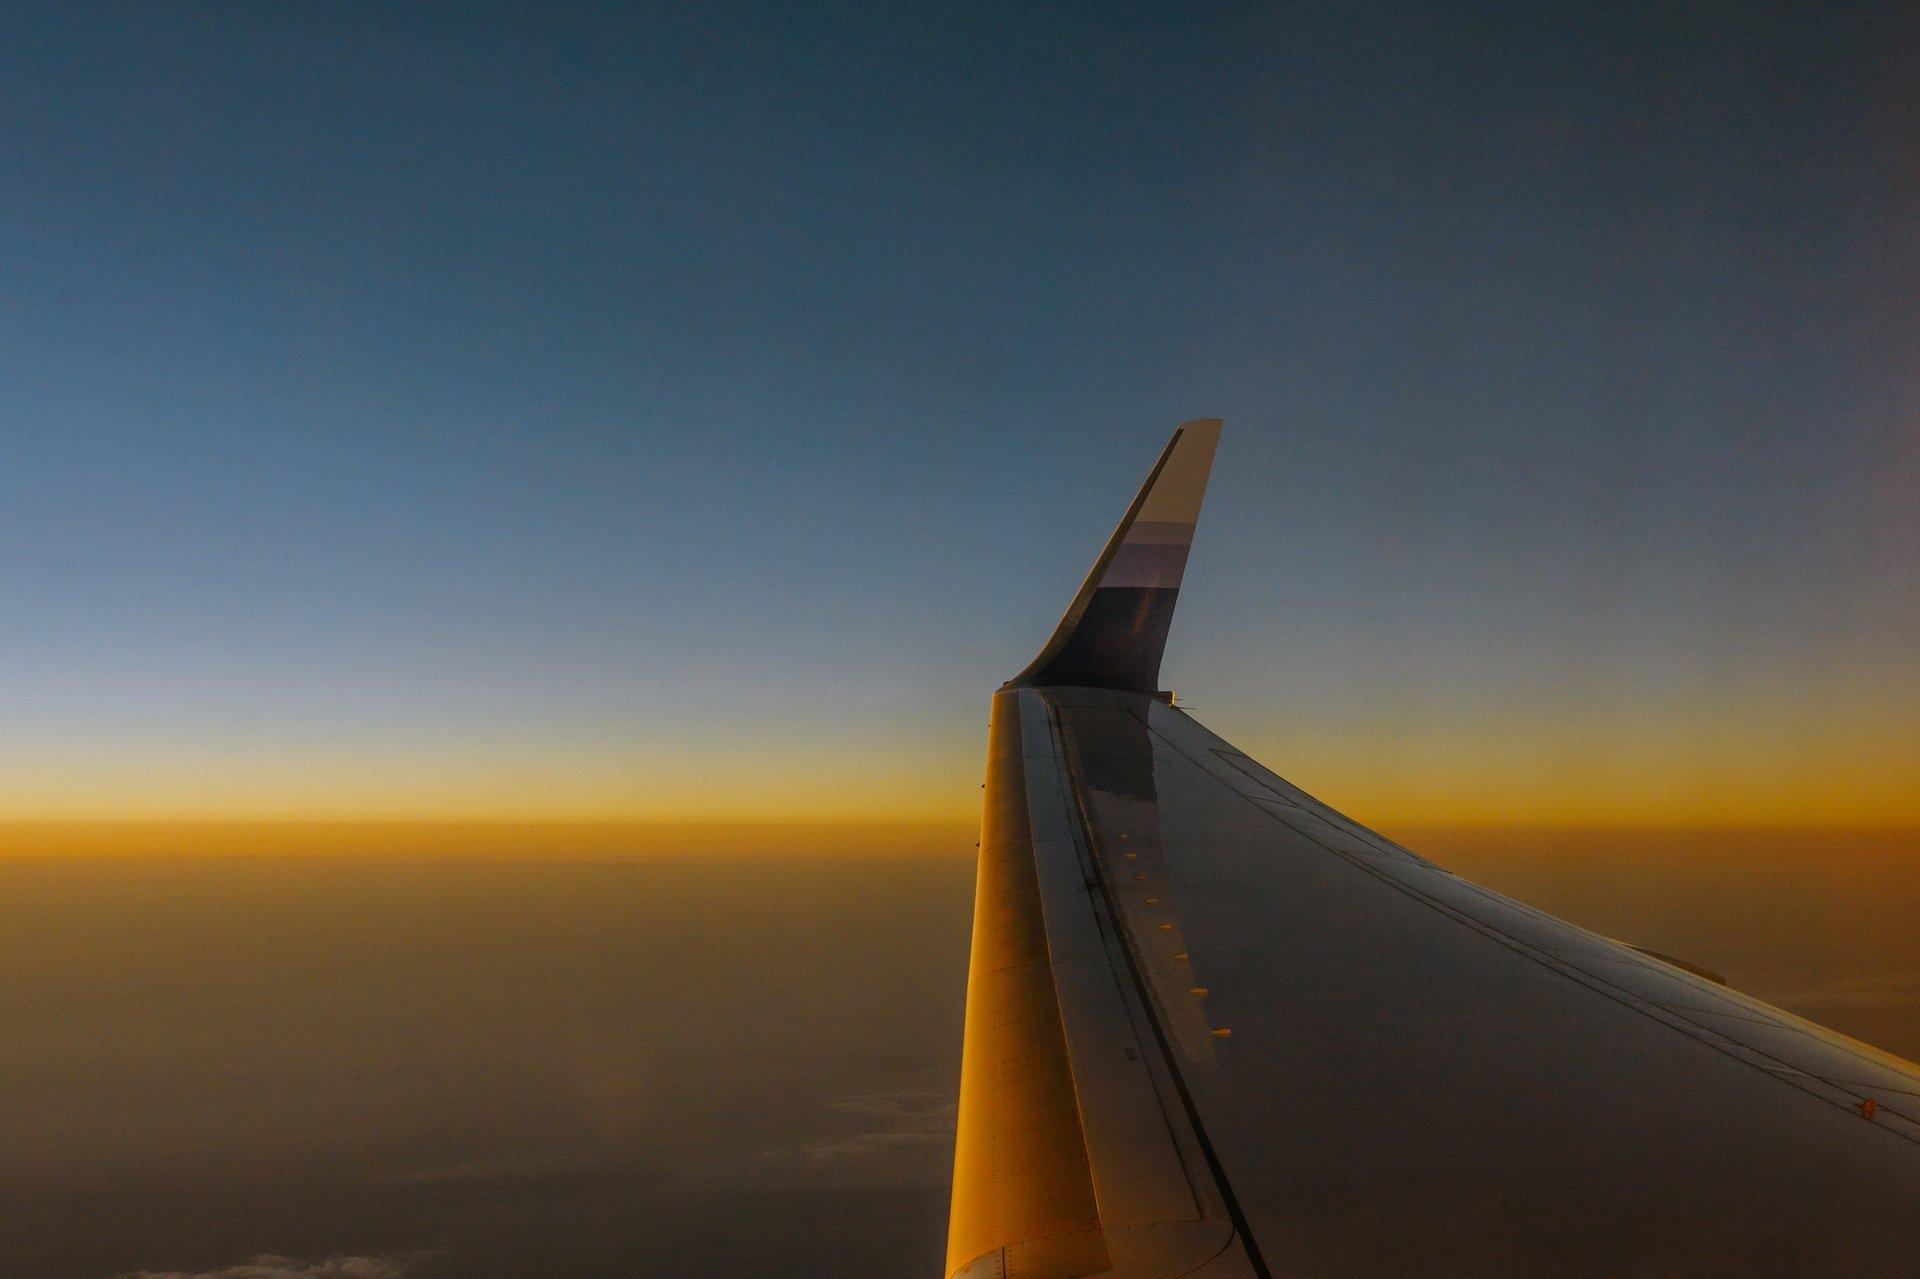 aircraft image 3.jpeg